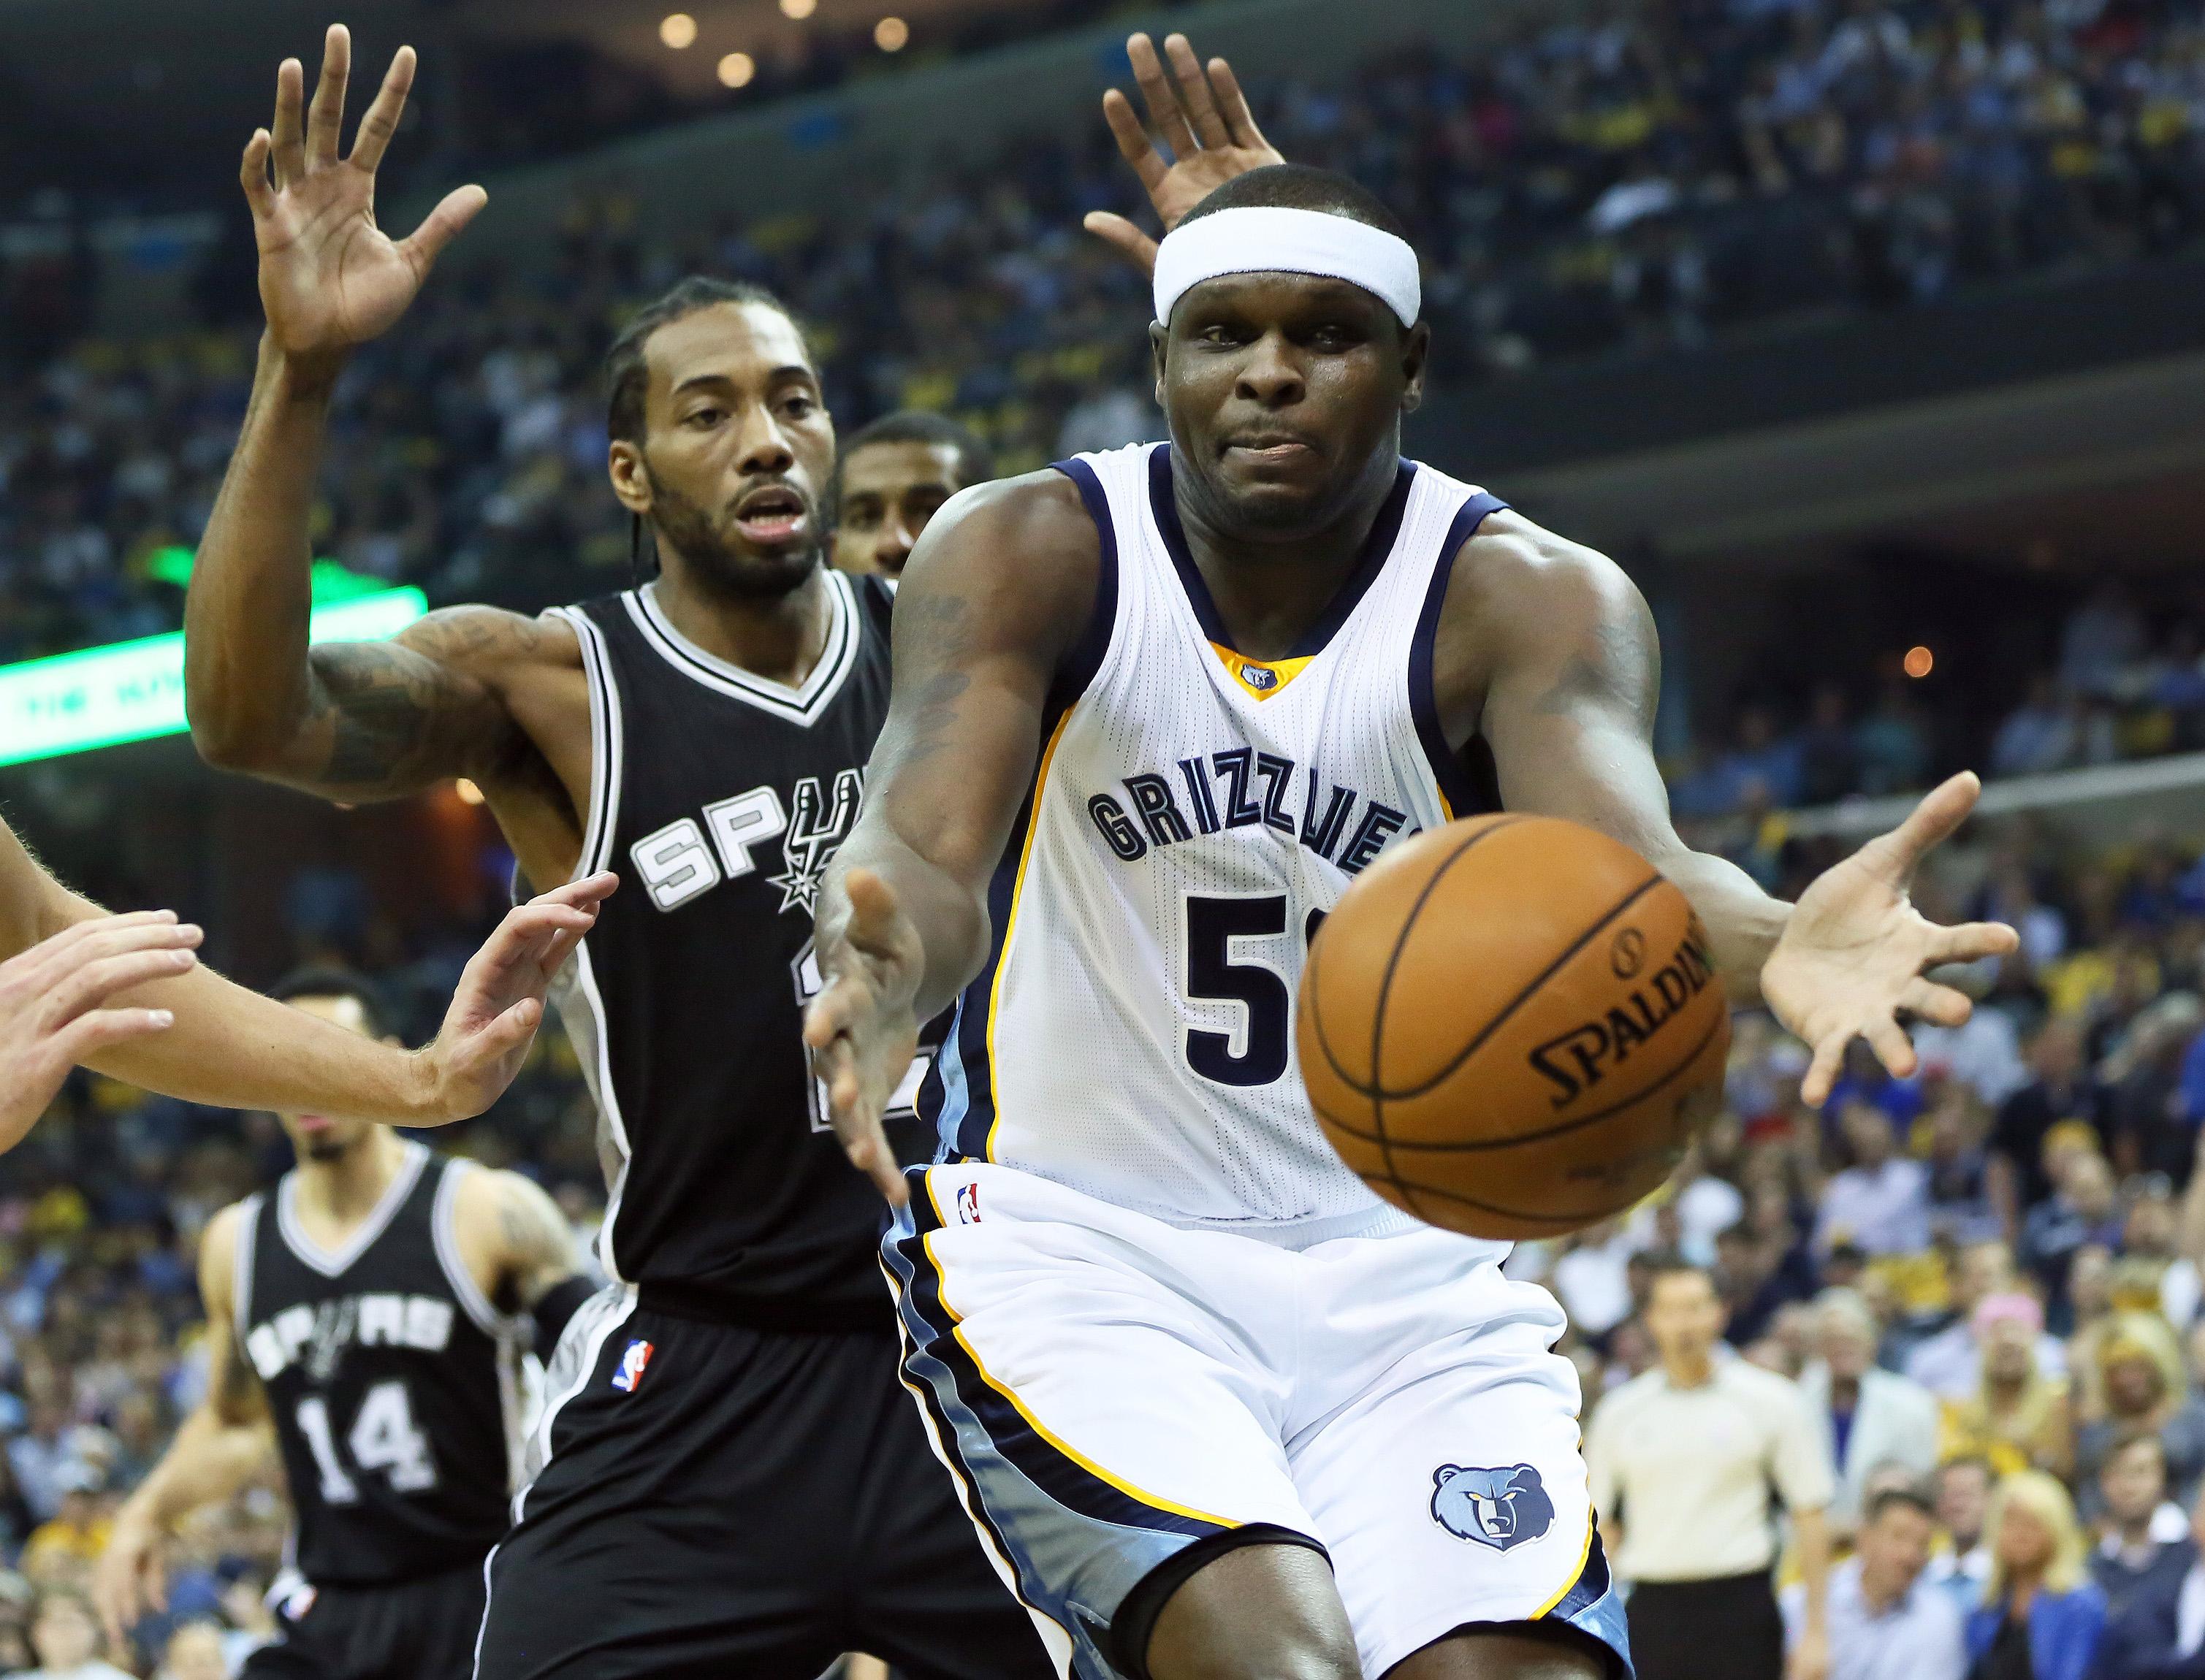 Zach randolph memphis grizzlies - Nba Playoffs San Antonio Spurs At Memphis Grizzlies